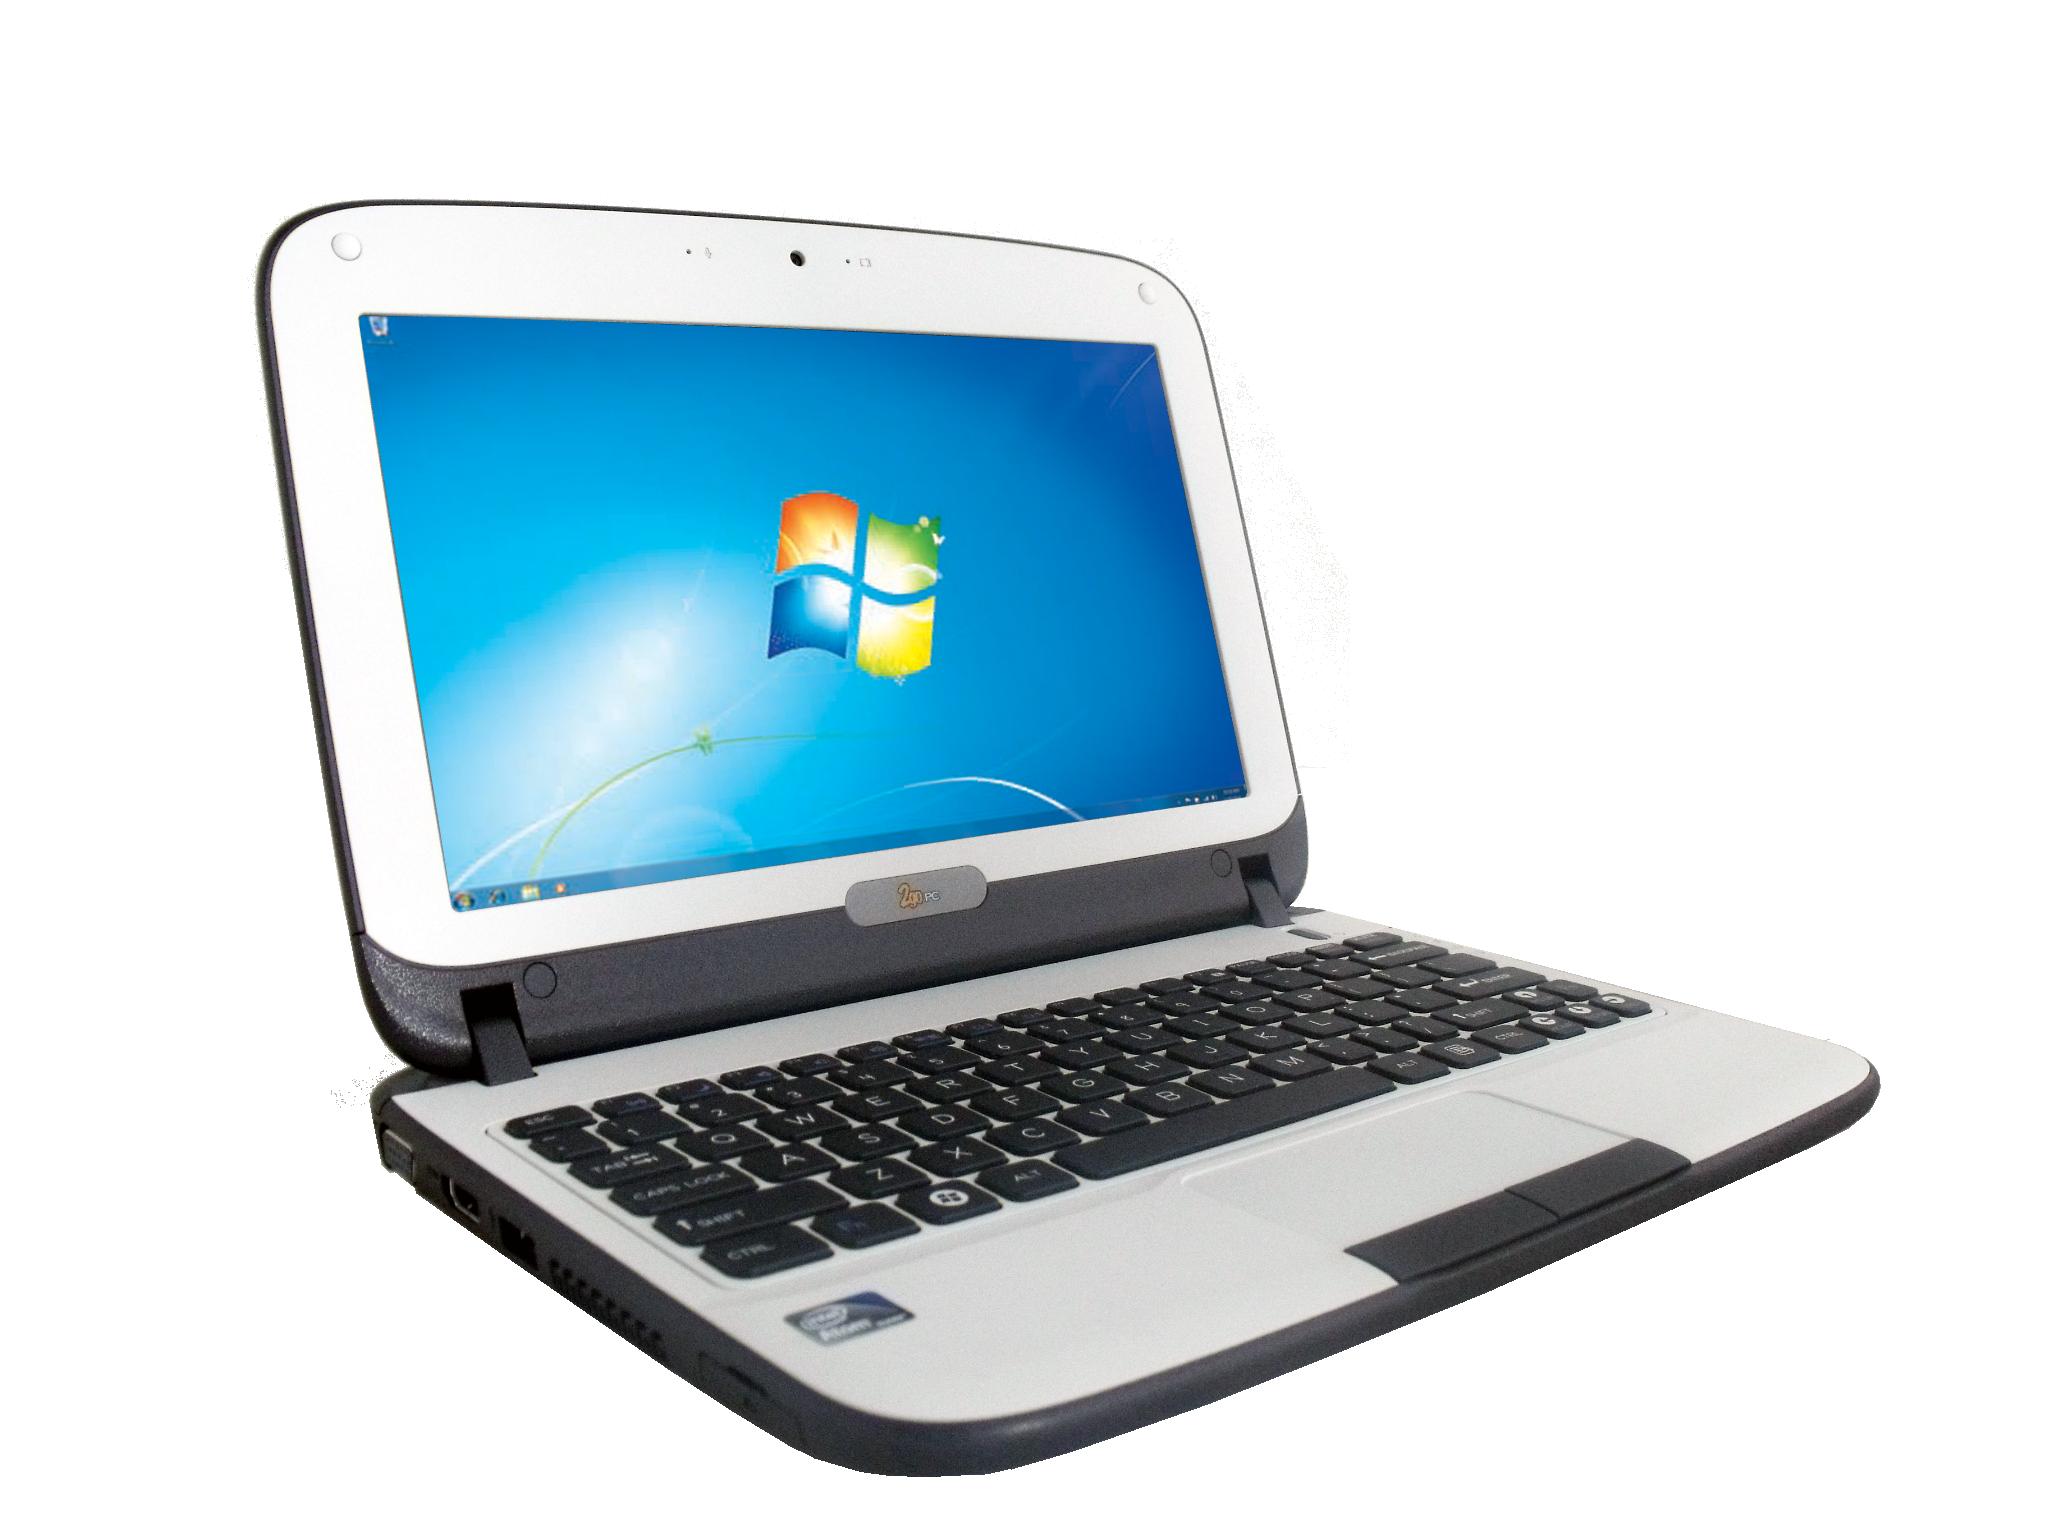 2gopc Rugged Chromebooks Tablets Laptops For Education Tablet Laptop Chromebook Education